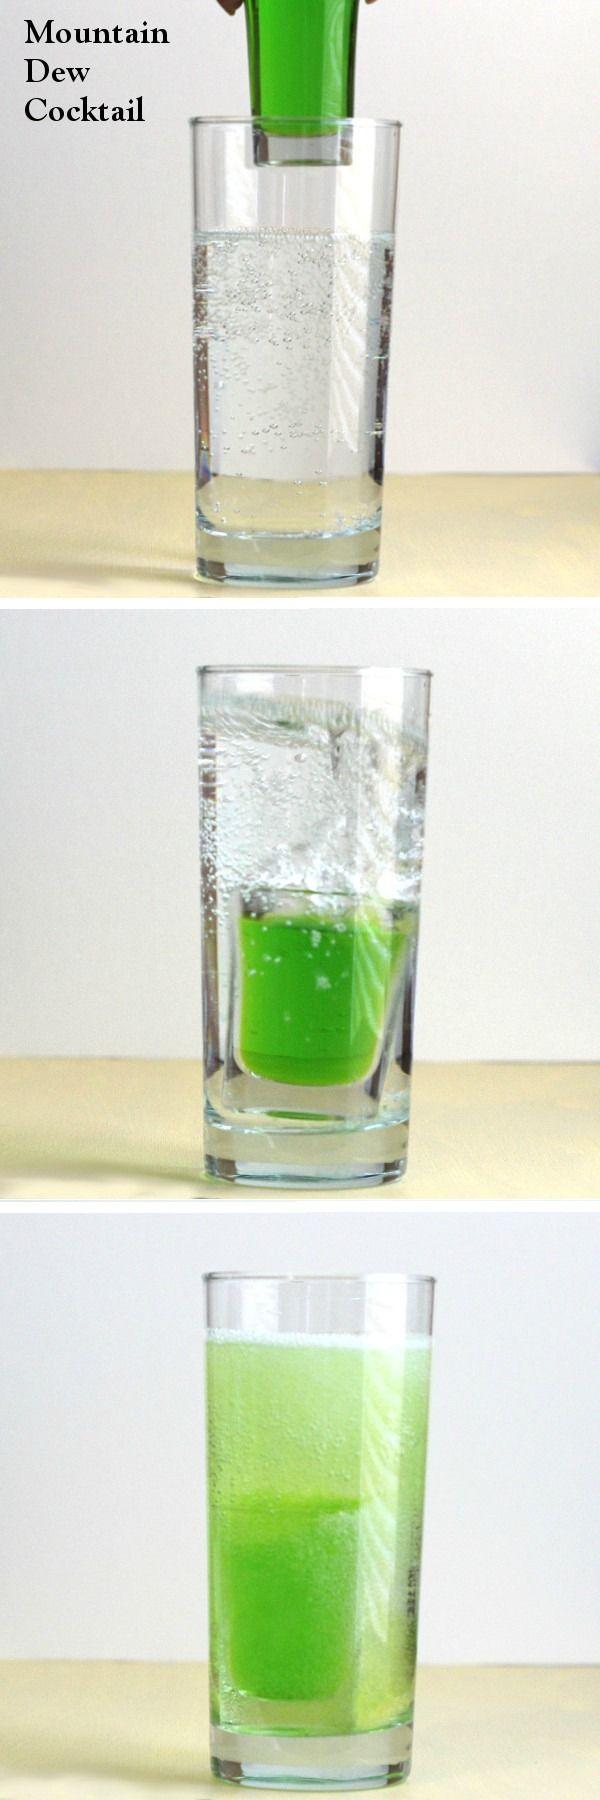 Mountain Dew drink recipe: Midori, vodka, beer, 7-up